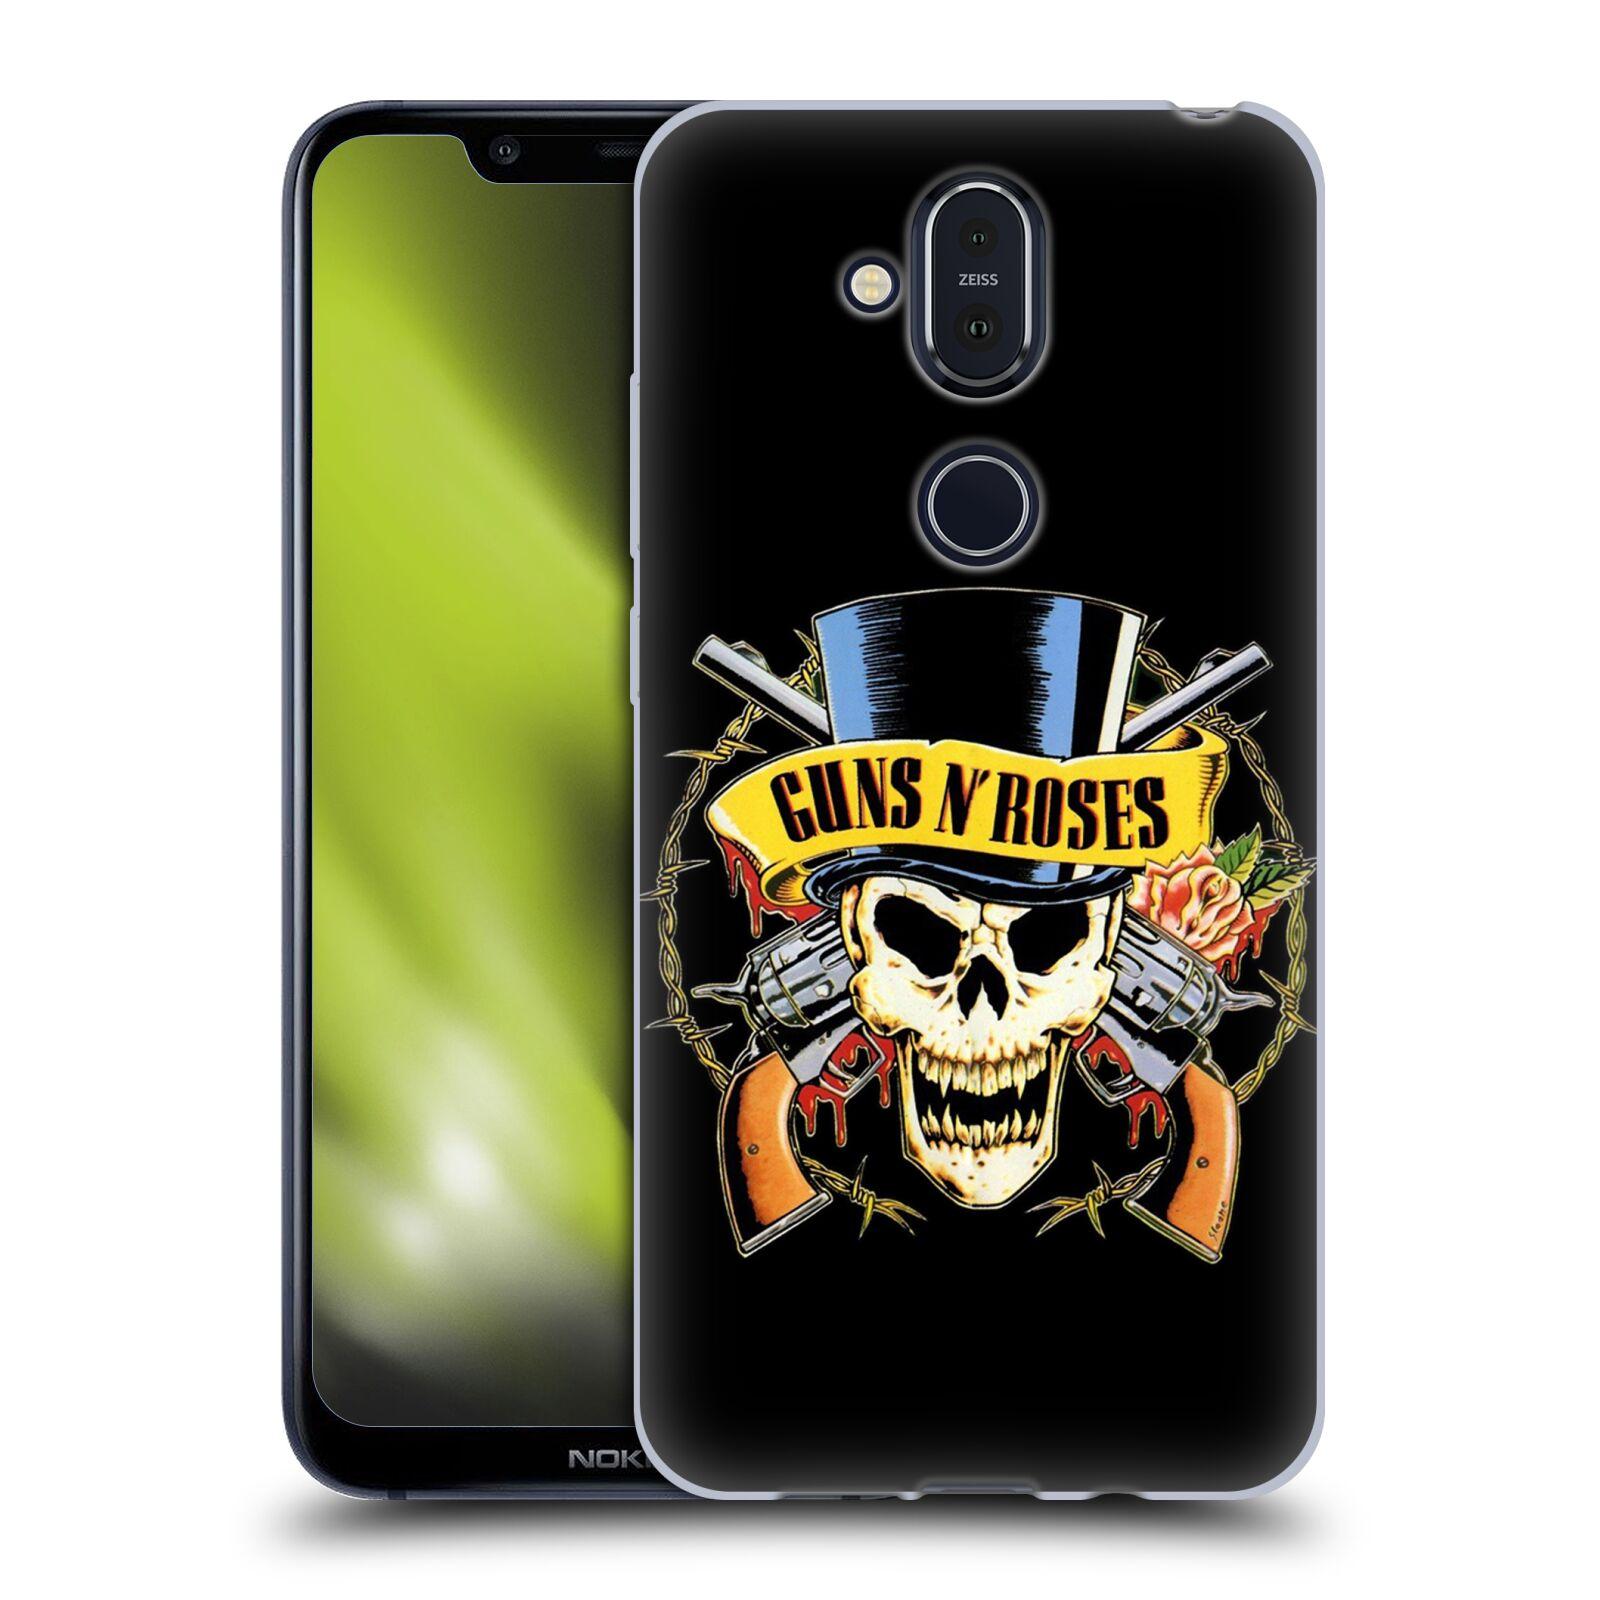 Silikonové pouzdro na mobil Nokia 8.1 - Head Case - Guns N' Roses - Lebka